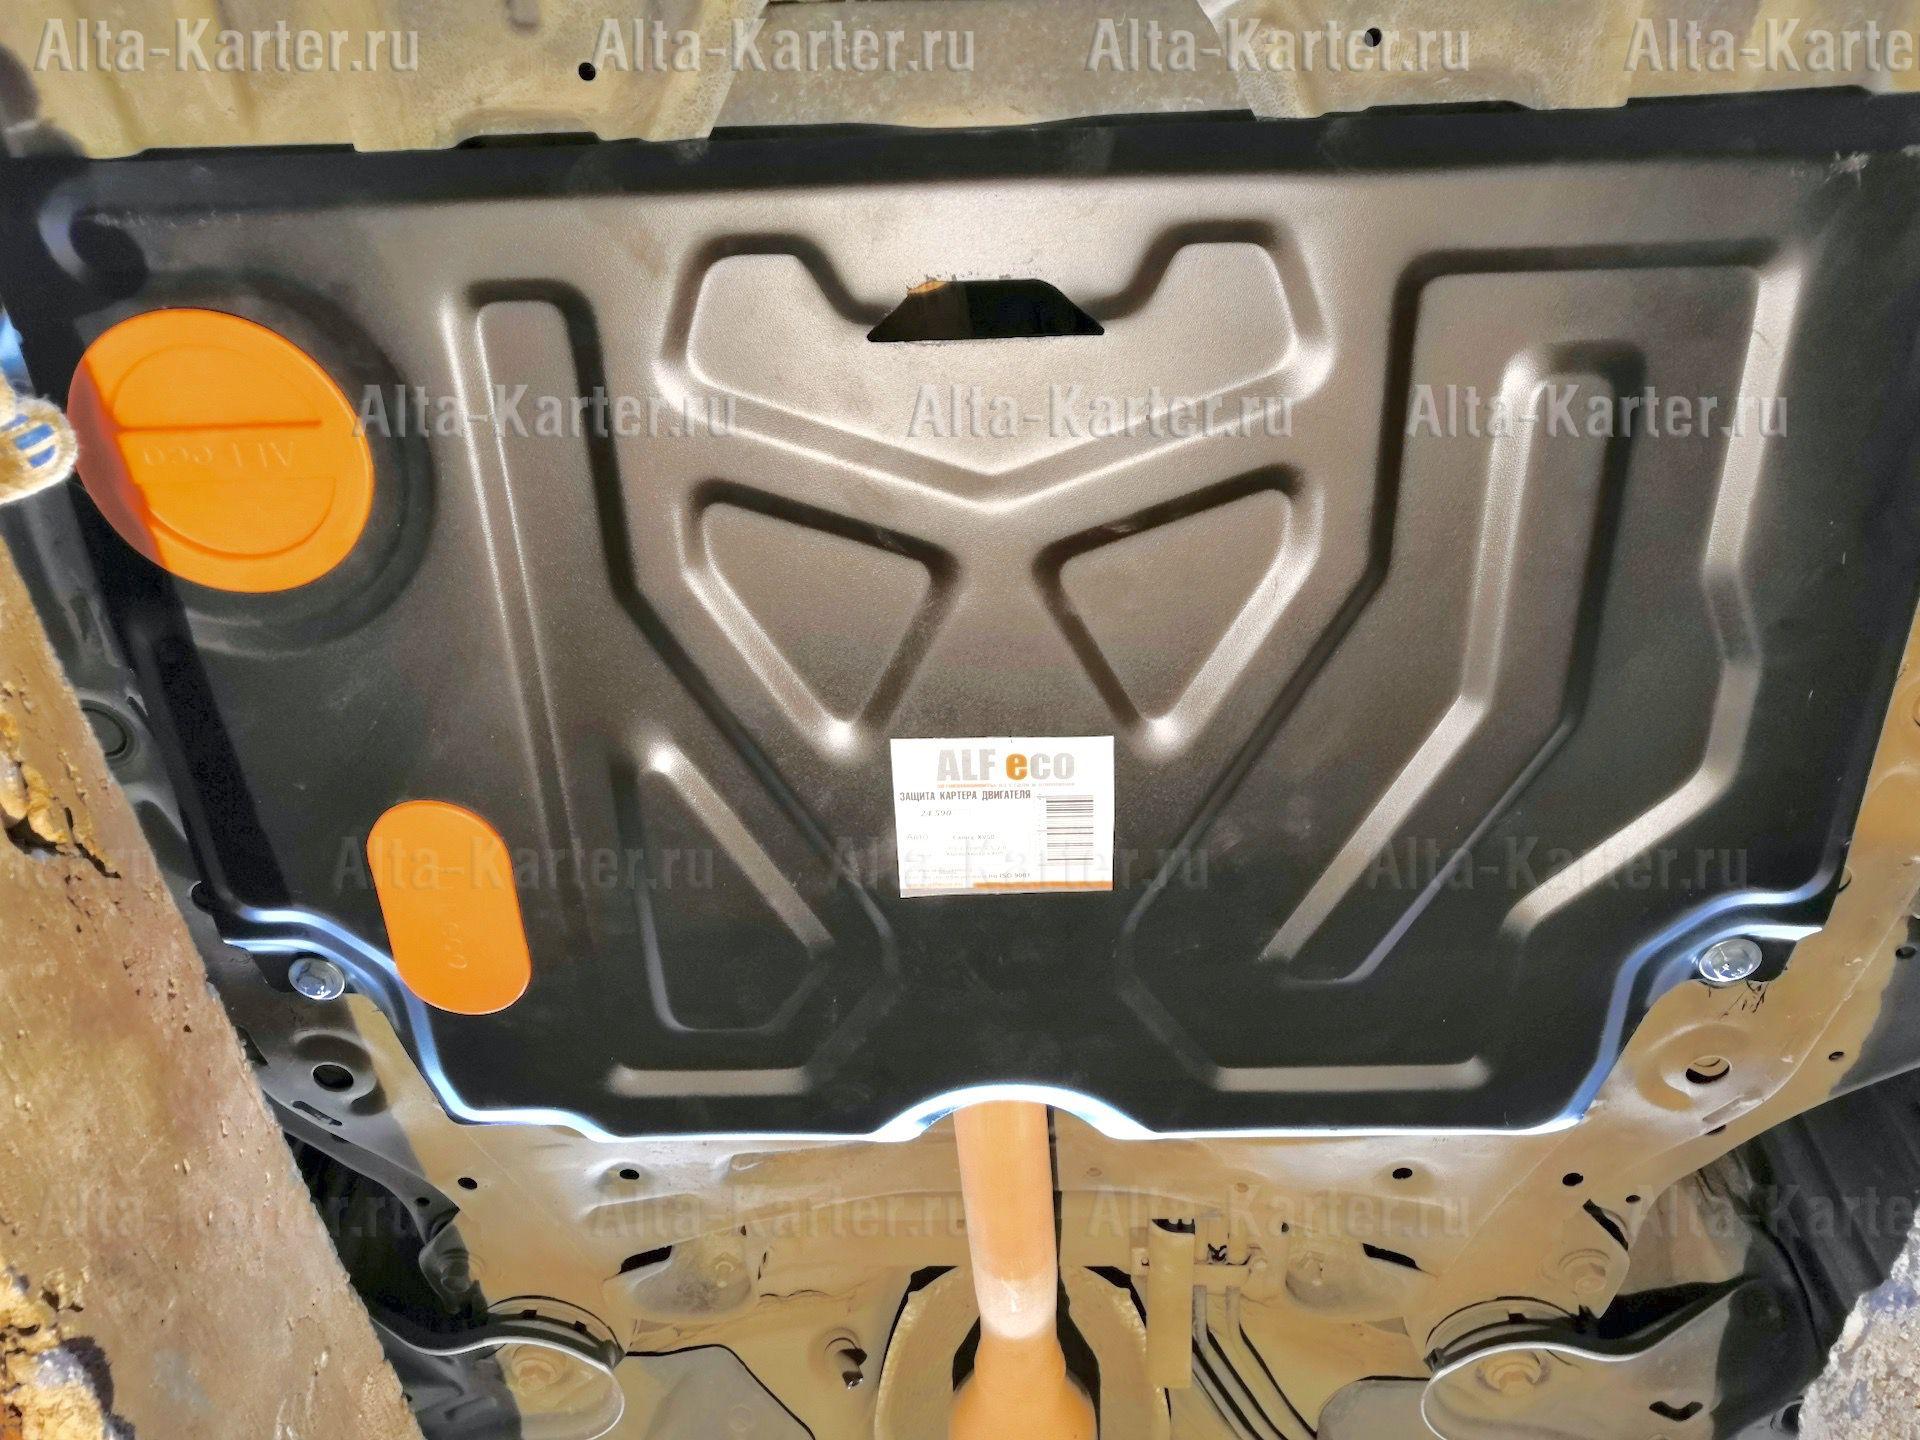 Защита Alfeco для картера и КПП Toyota Camry VII XV50 2011-2018. Артикул ALF.24.590st